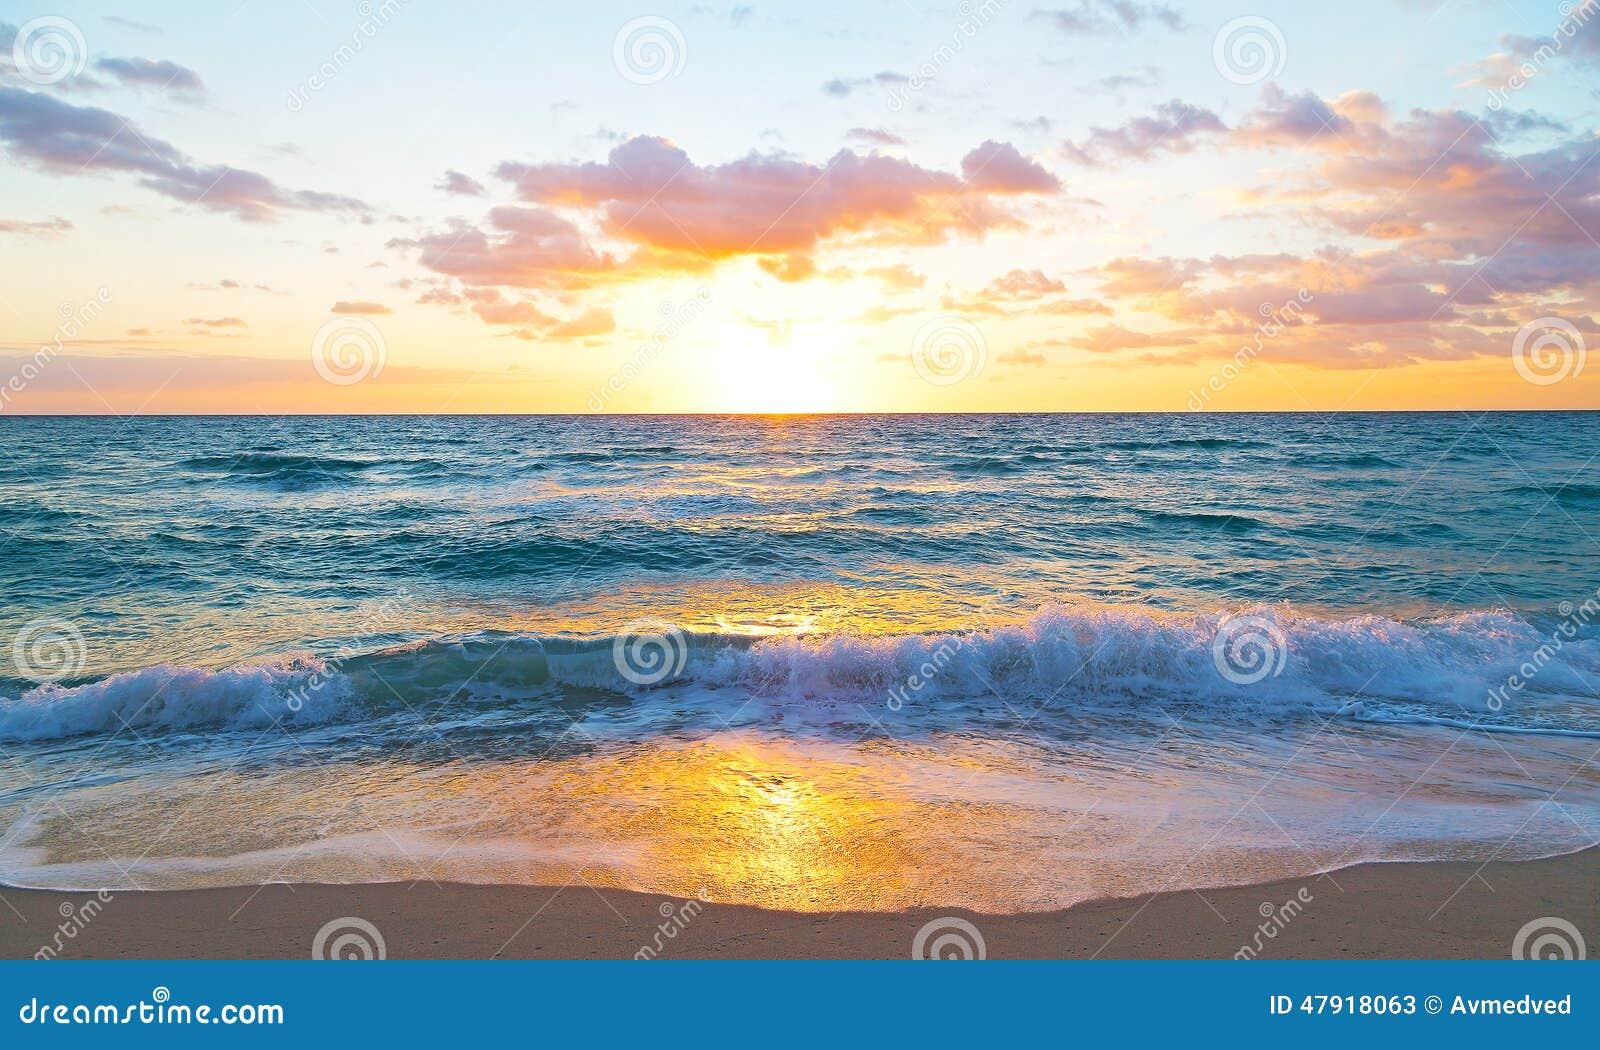 Sunrise Over The Ocean In Miami Beach Florida Stock